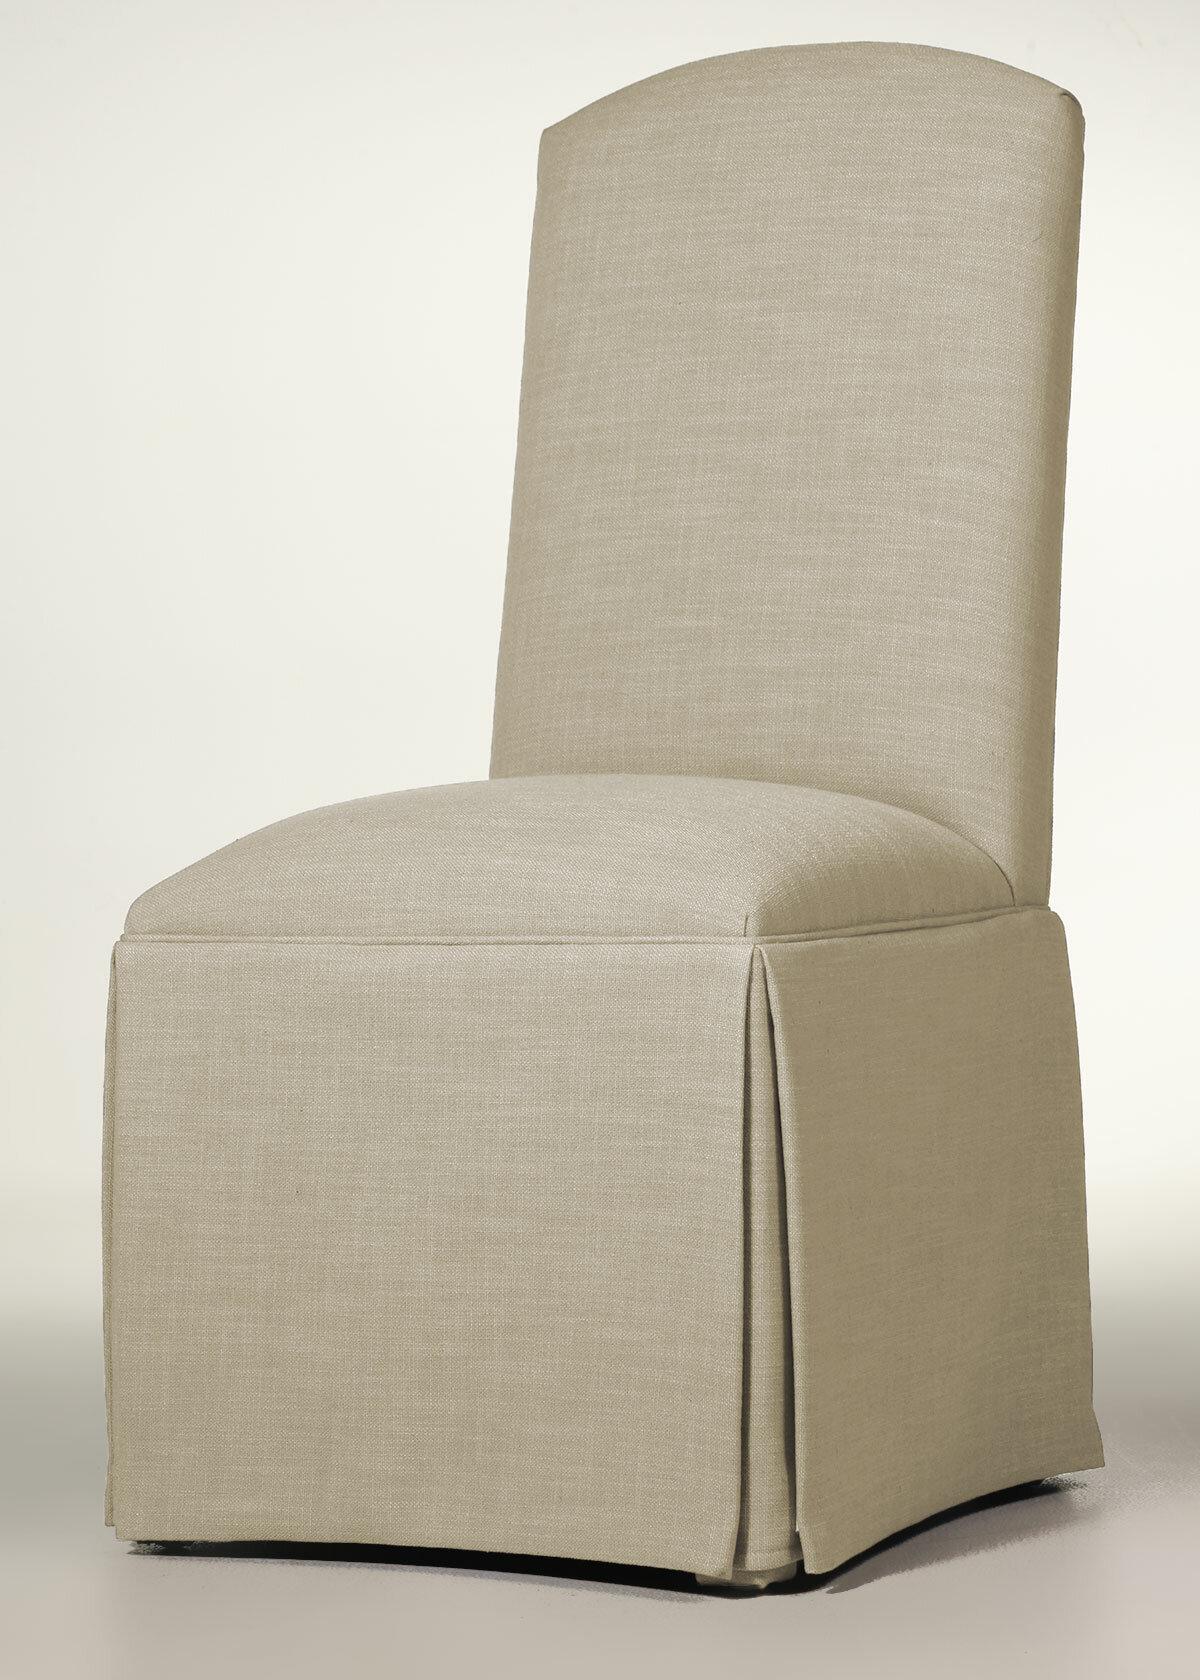 Sensational Lamoille Traditional Skirted Upholstered Dining Chair Ibusinesslaw Wood Chair Design Ideas Ibusinesslaworg